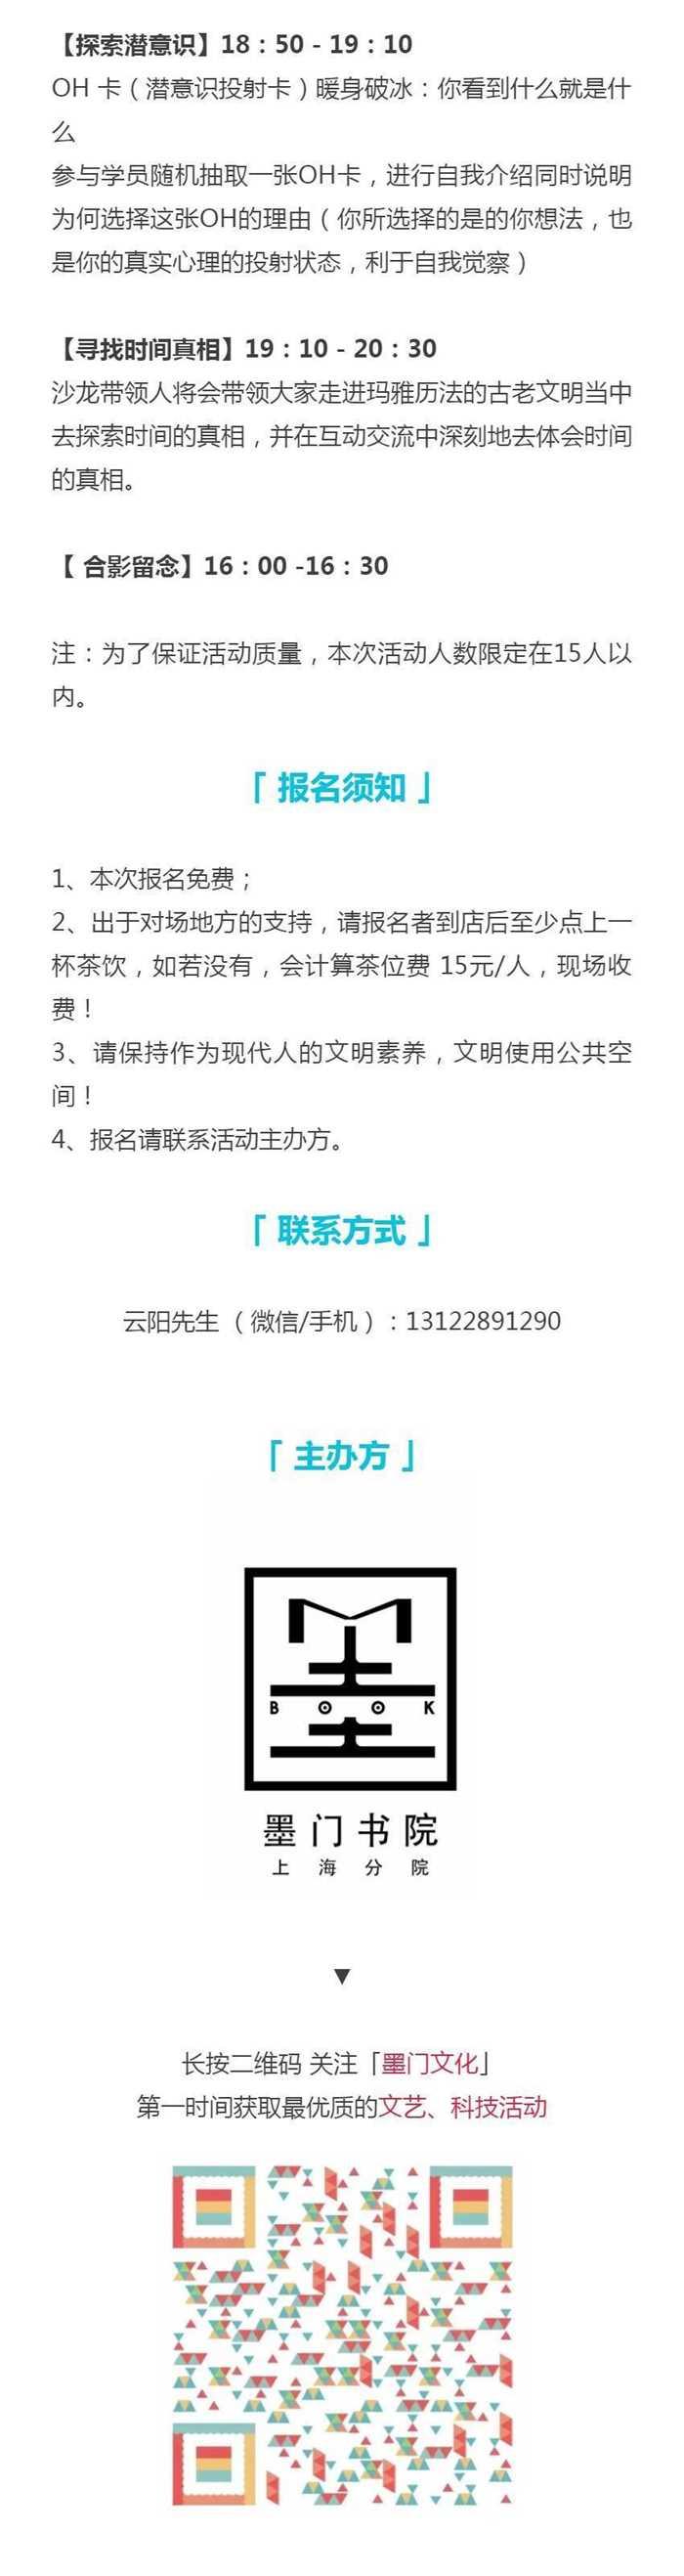 mp.weixin.qq.com_s_oqUz2r3stmF6wkLHEGu8ww2.jpg